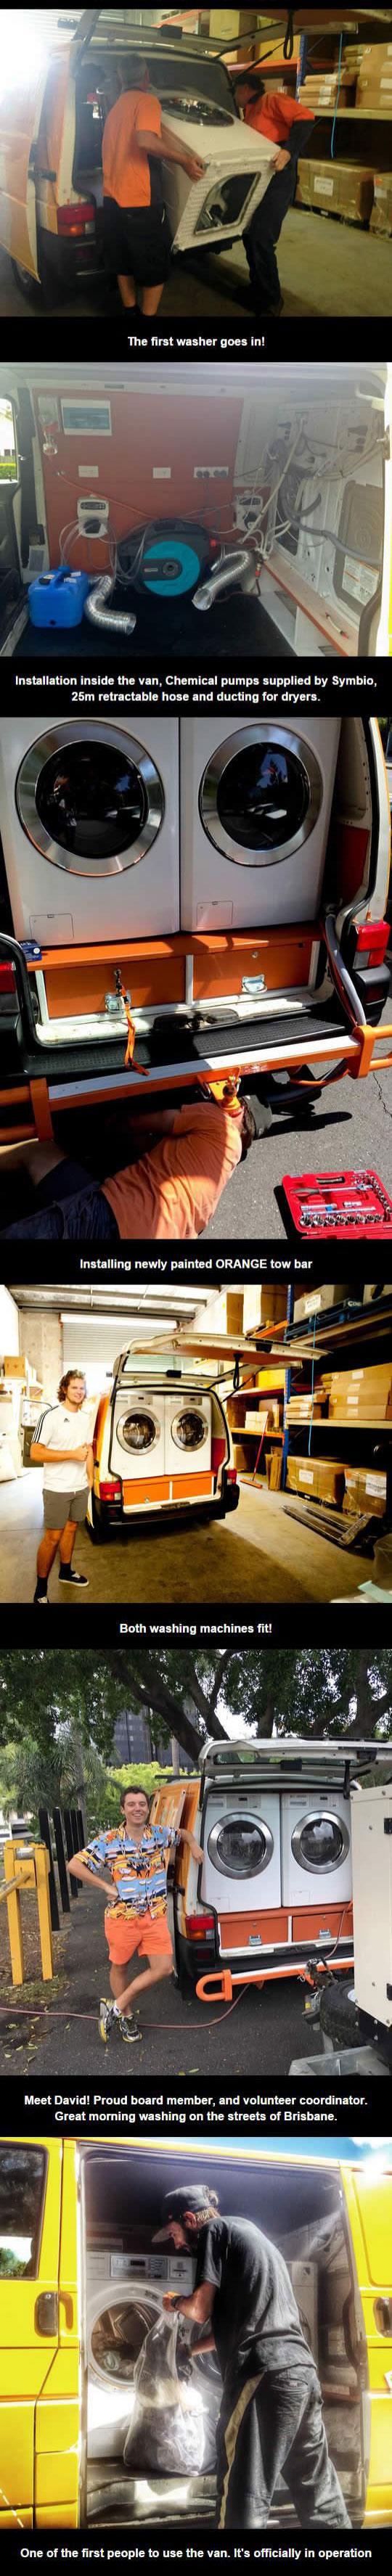 cool-van-washing-machine-street-homeless